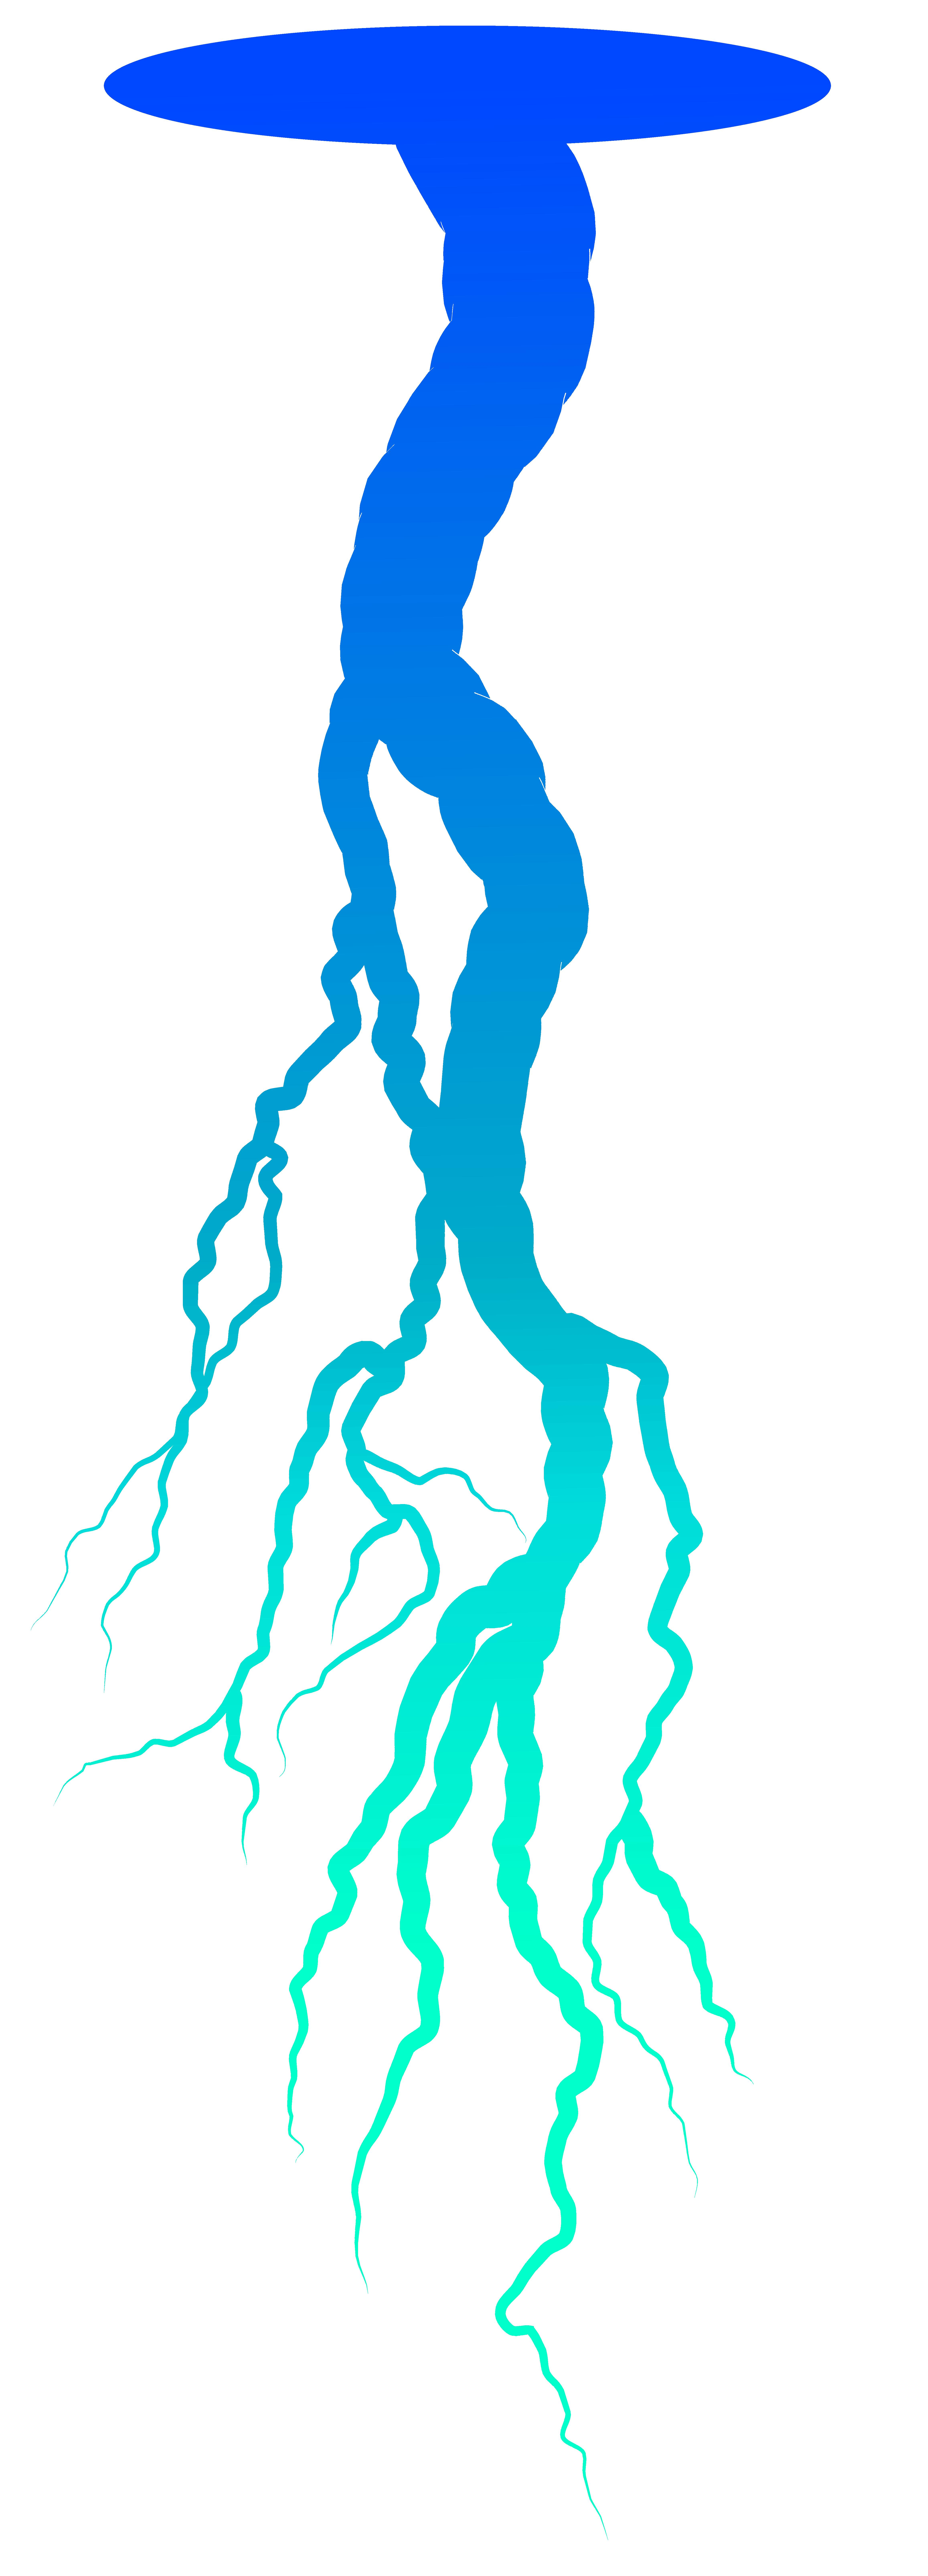 Png transparent clip art. Lightning clipart blue